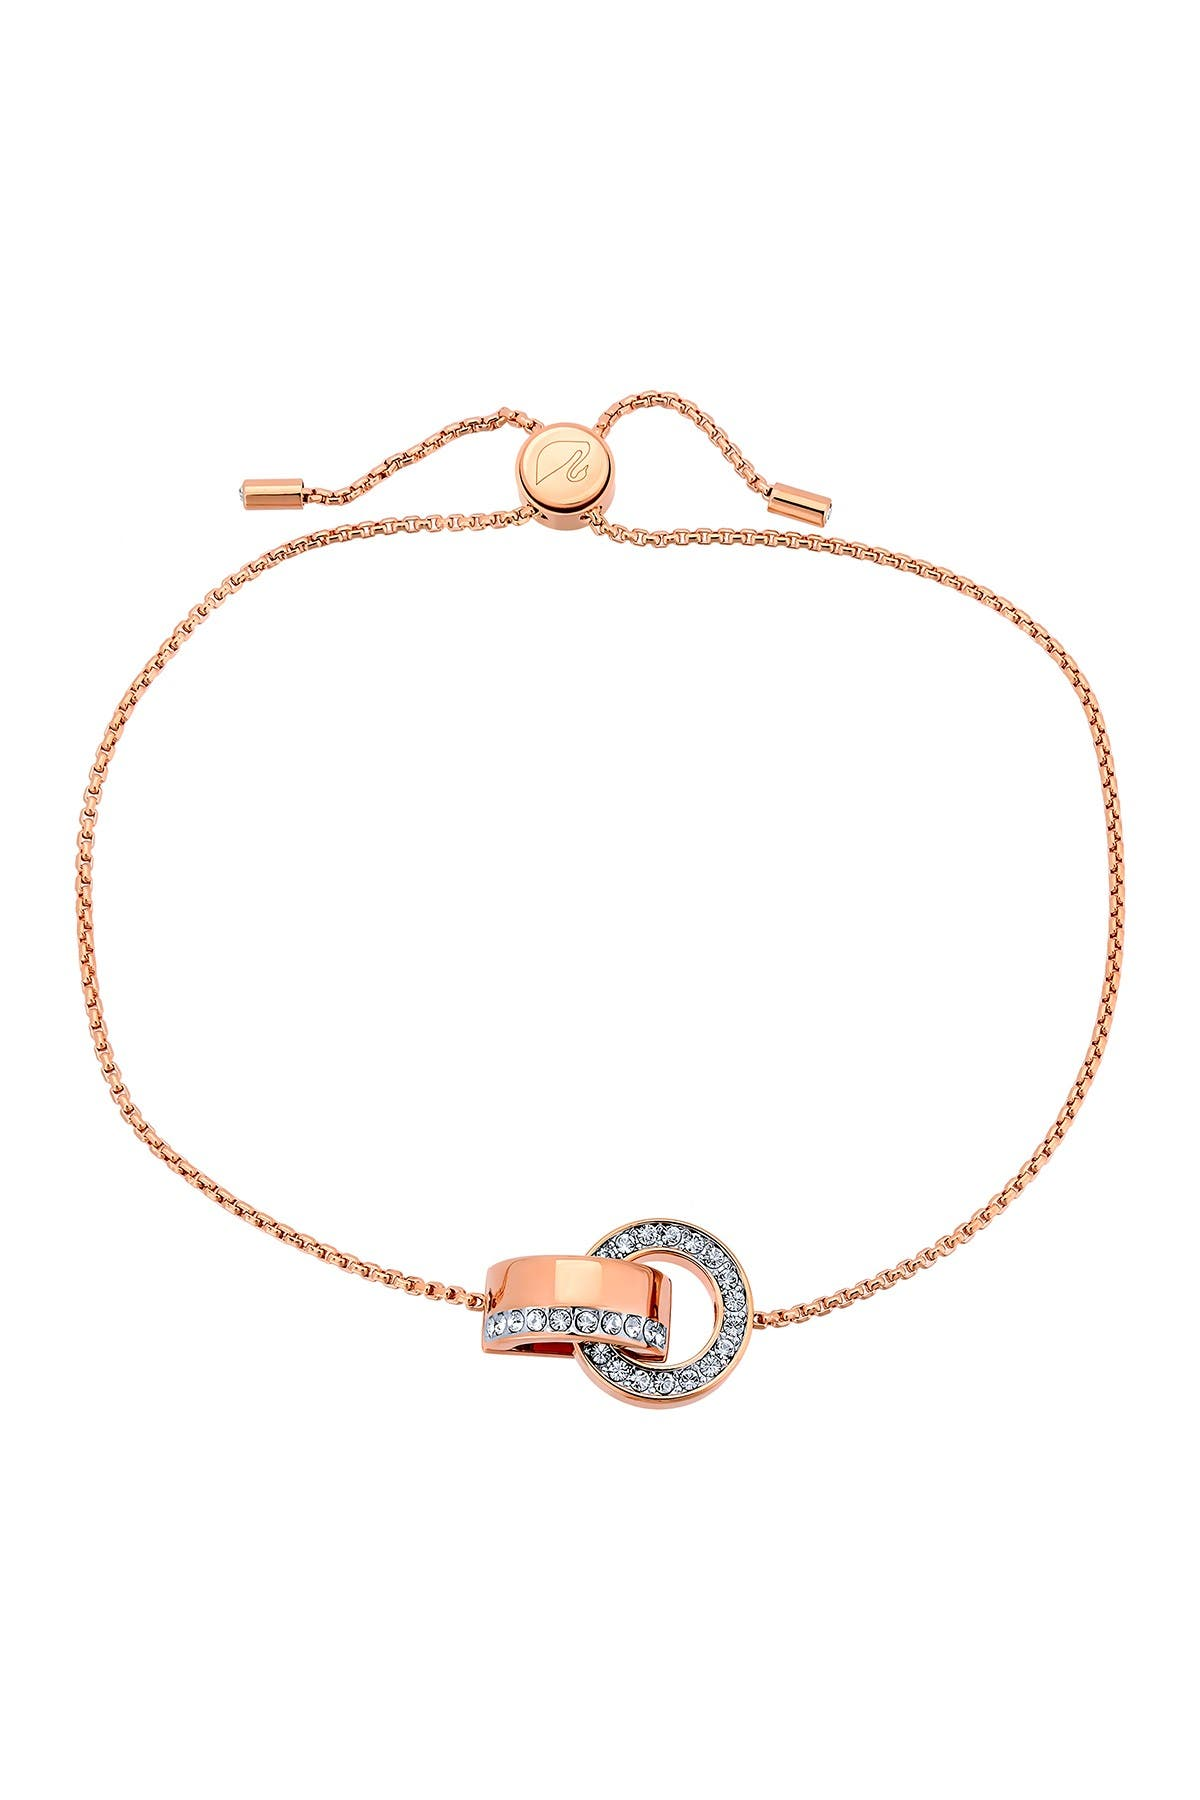 Image of Swarovski Hollow Pave Swarovski Crystal Interlocking Ring Bracelet